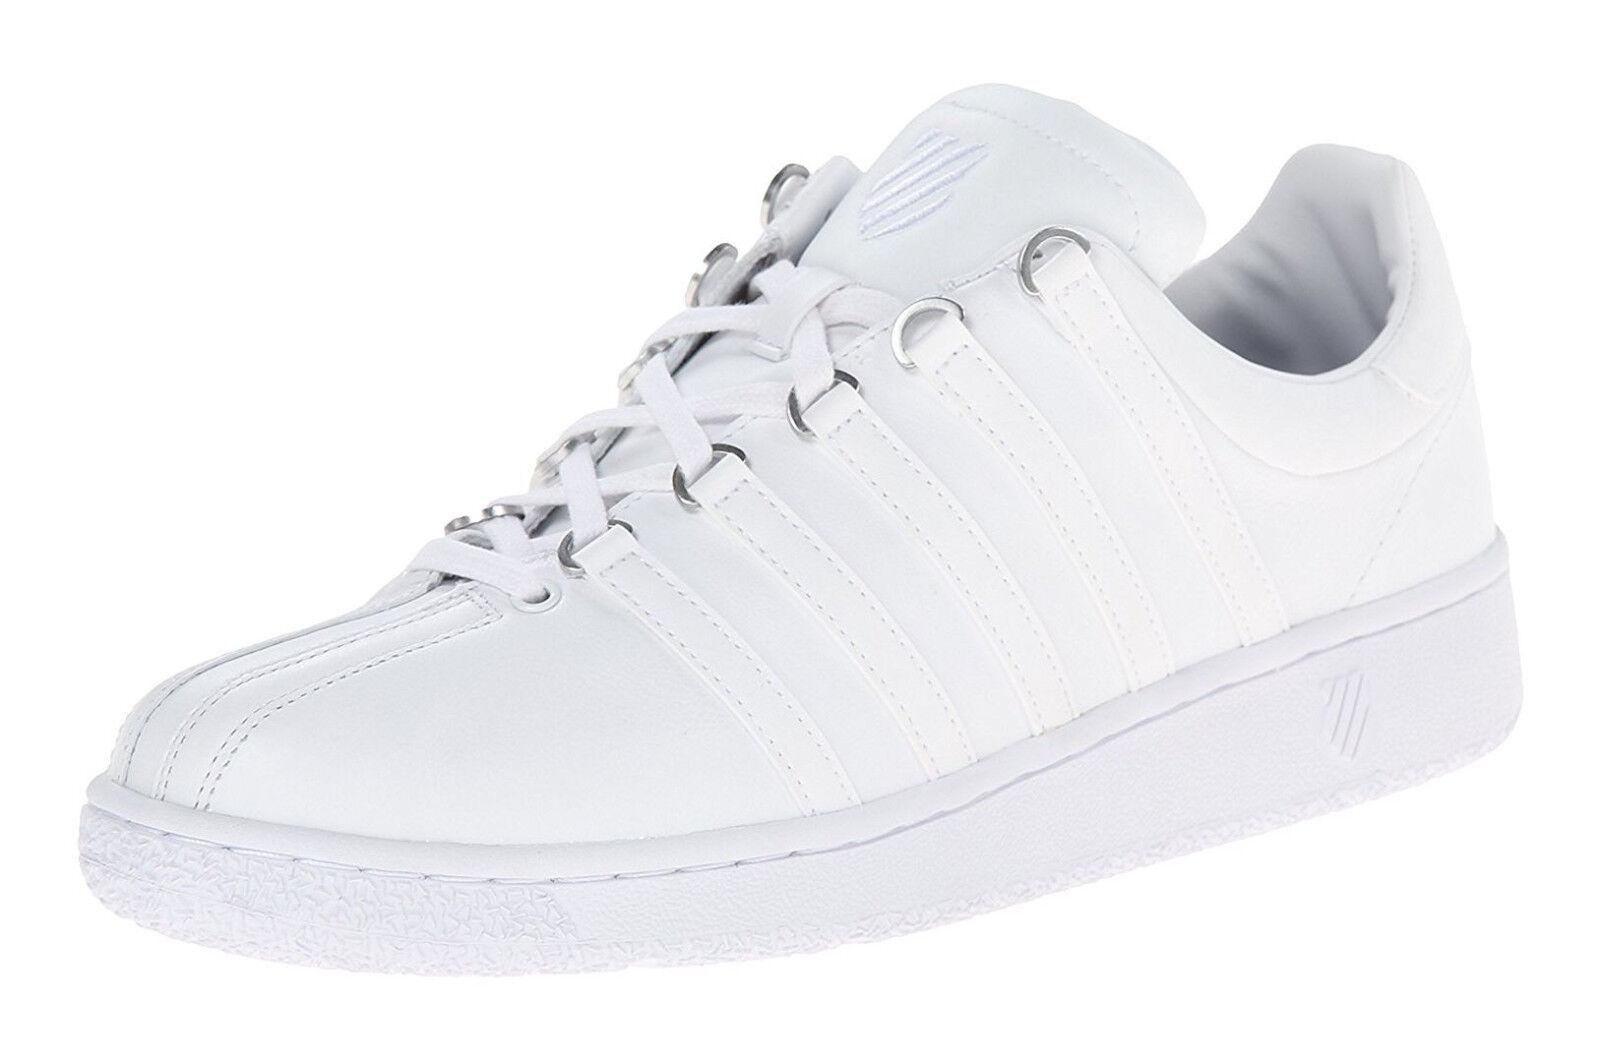 K-Swiss Classic VN blanco, blanco Mens zapatillas Tennis zapatos Item 03343-101